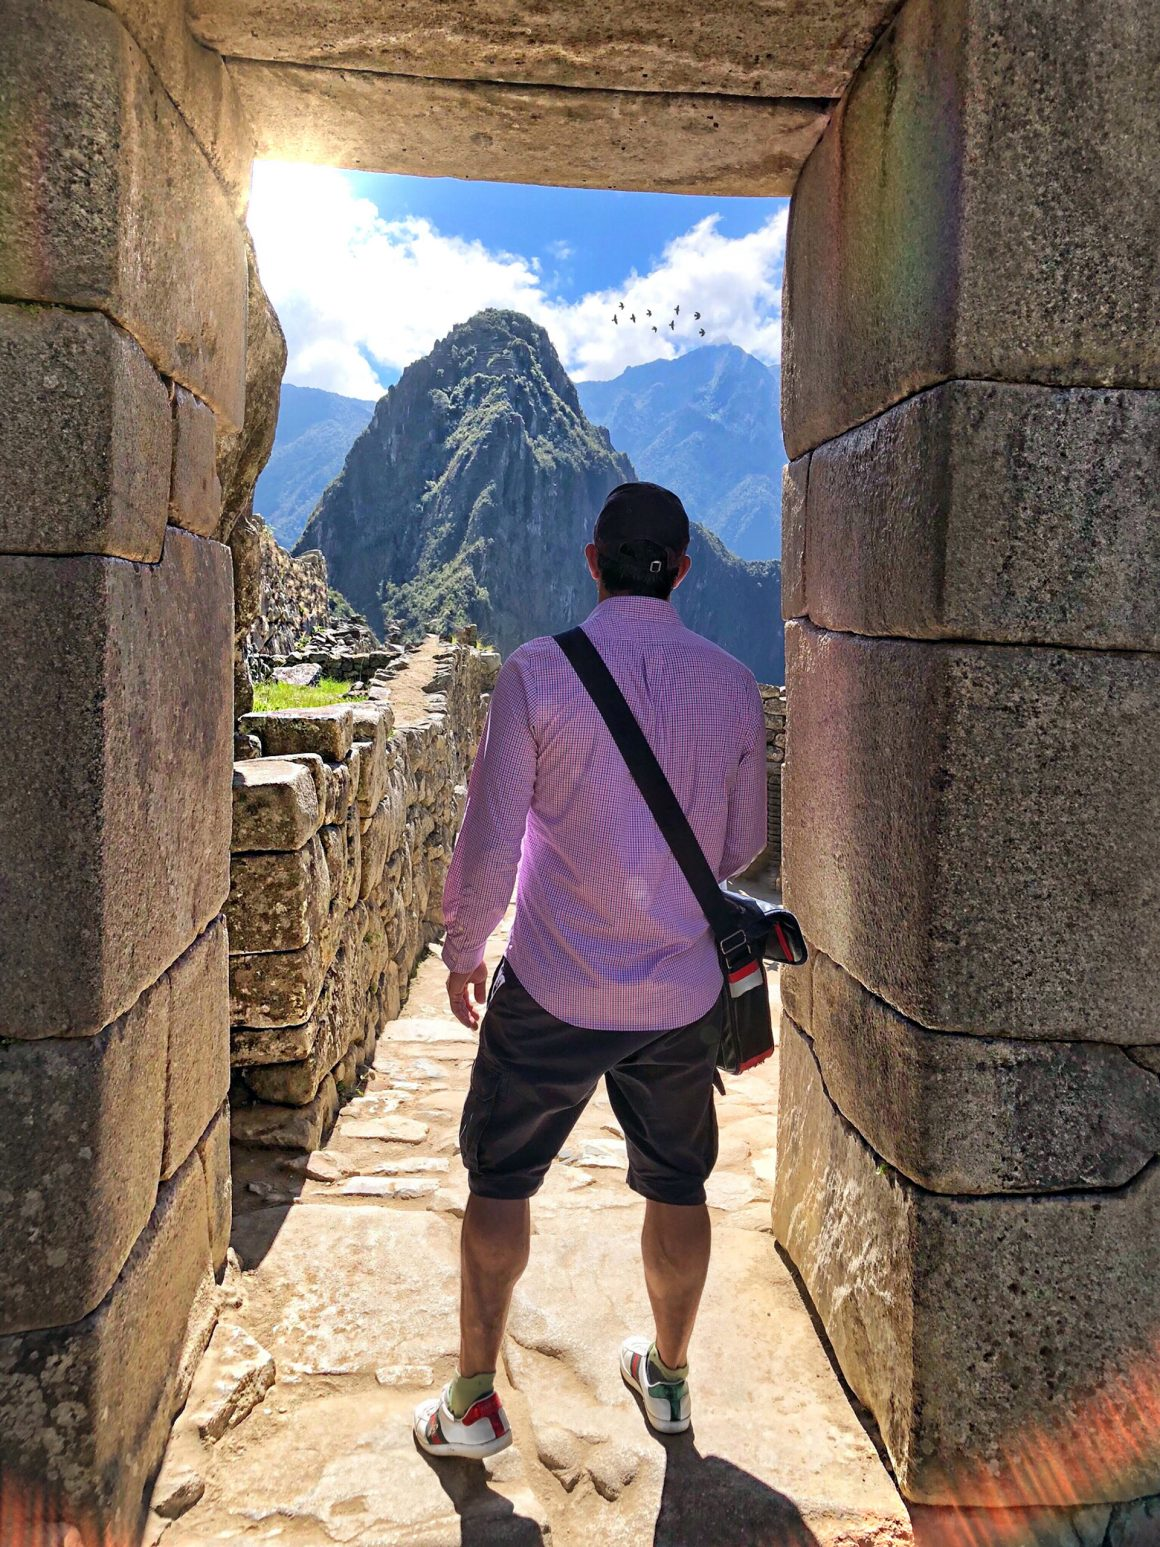 aguas calientes machu picchu pueblo perurail peru ruta por perú en dos semanas - aguas calientes machu picchu pueblo perurail peru 29 1160x1547 - Nuestra Ruta por Perú en dos semanas : Diario de Viaje a Perú